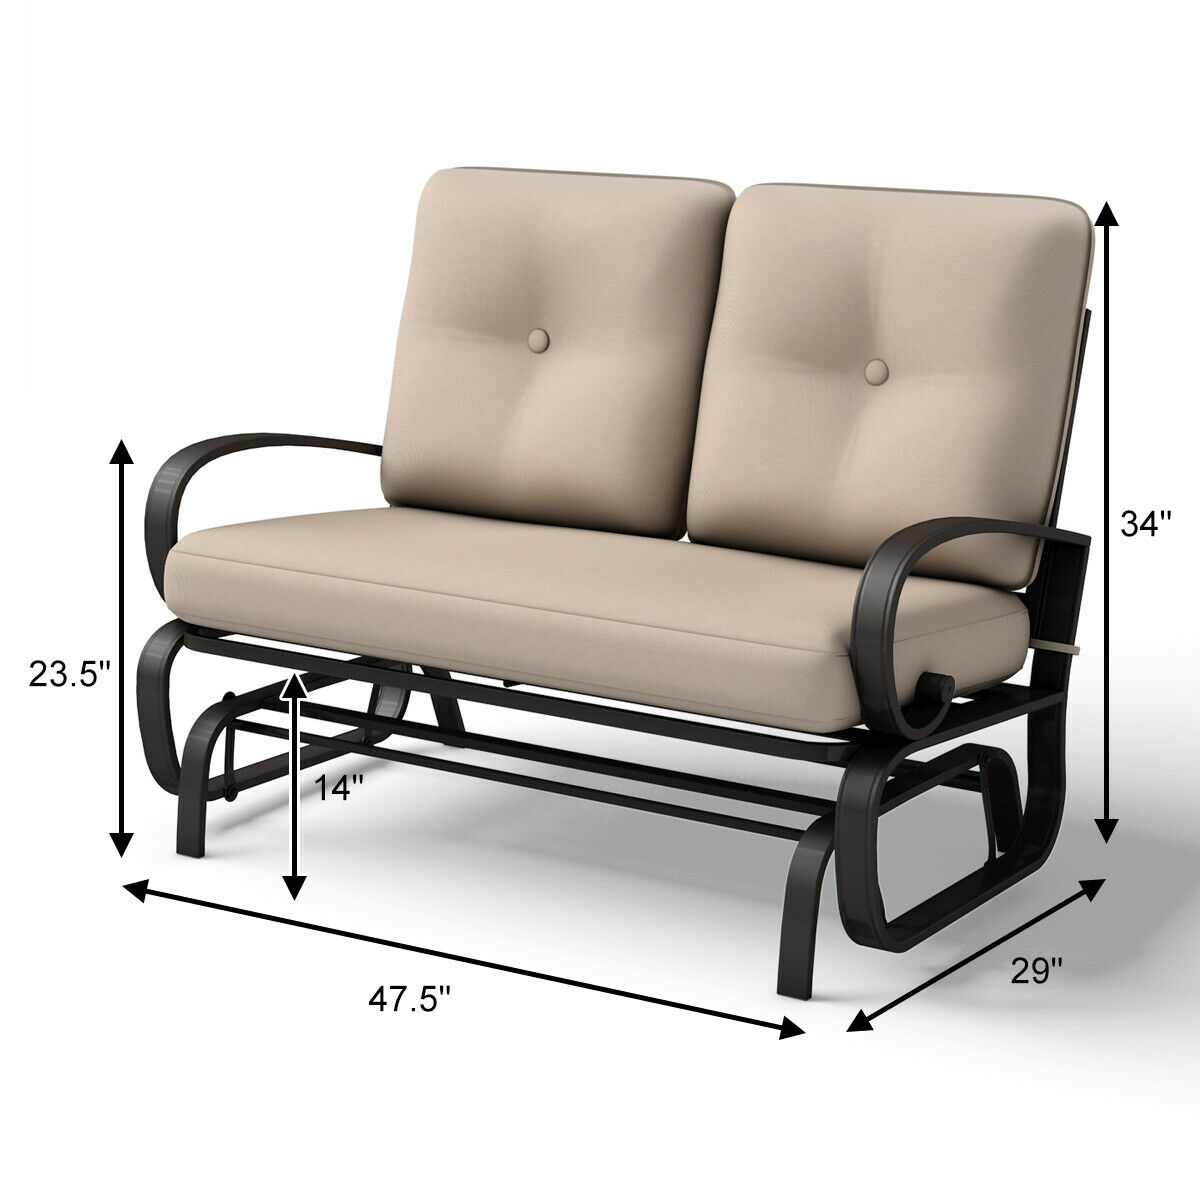 Costway Glider Outdoor Patio Rocking Bench Loveseat Regarding Black Outdoor Durable Steel Frame Patio Swing Glider Bench Chairs (Image 7 of 25)